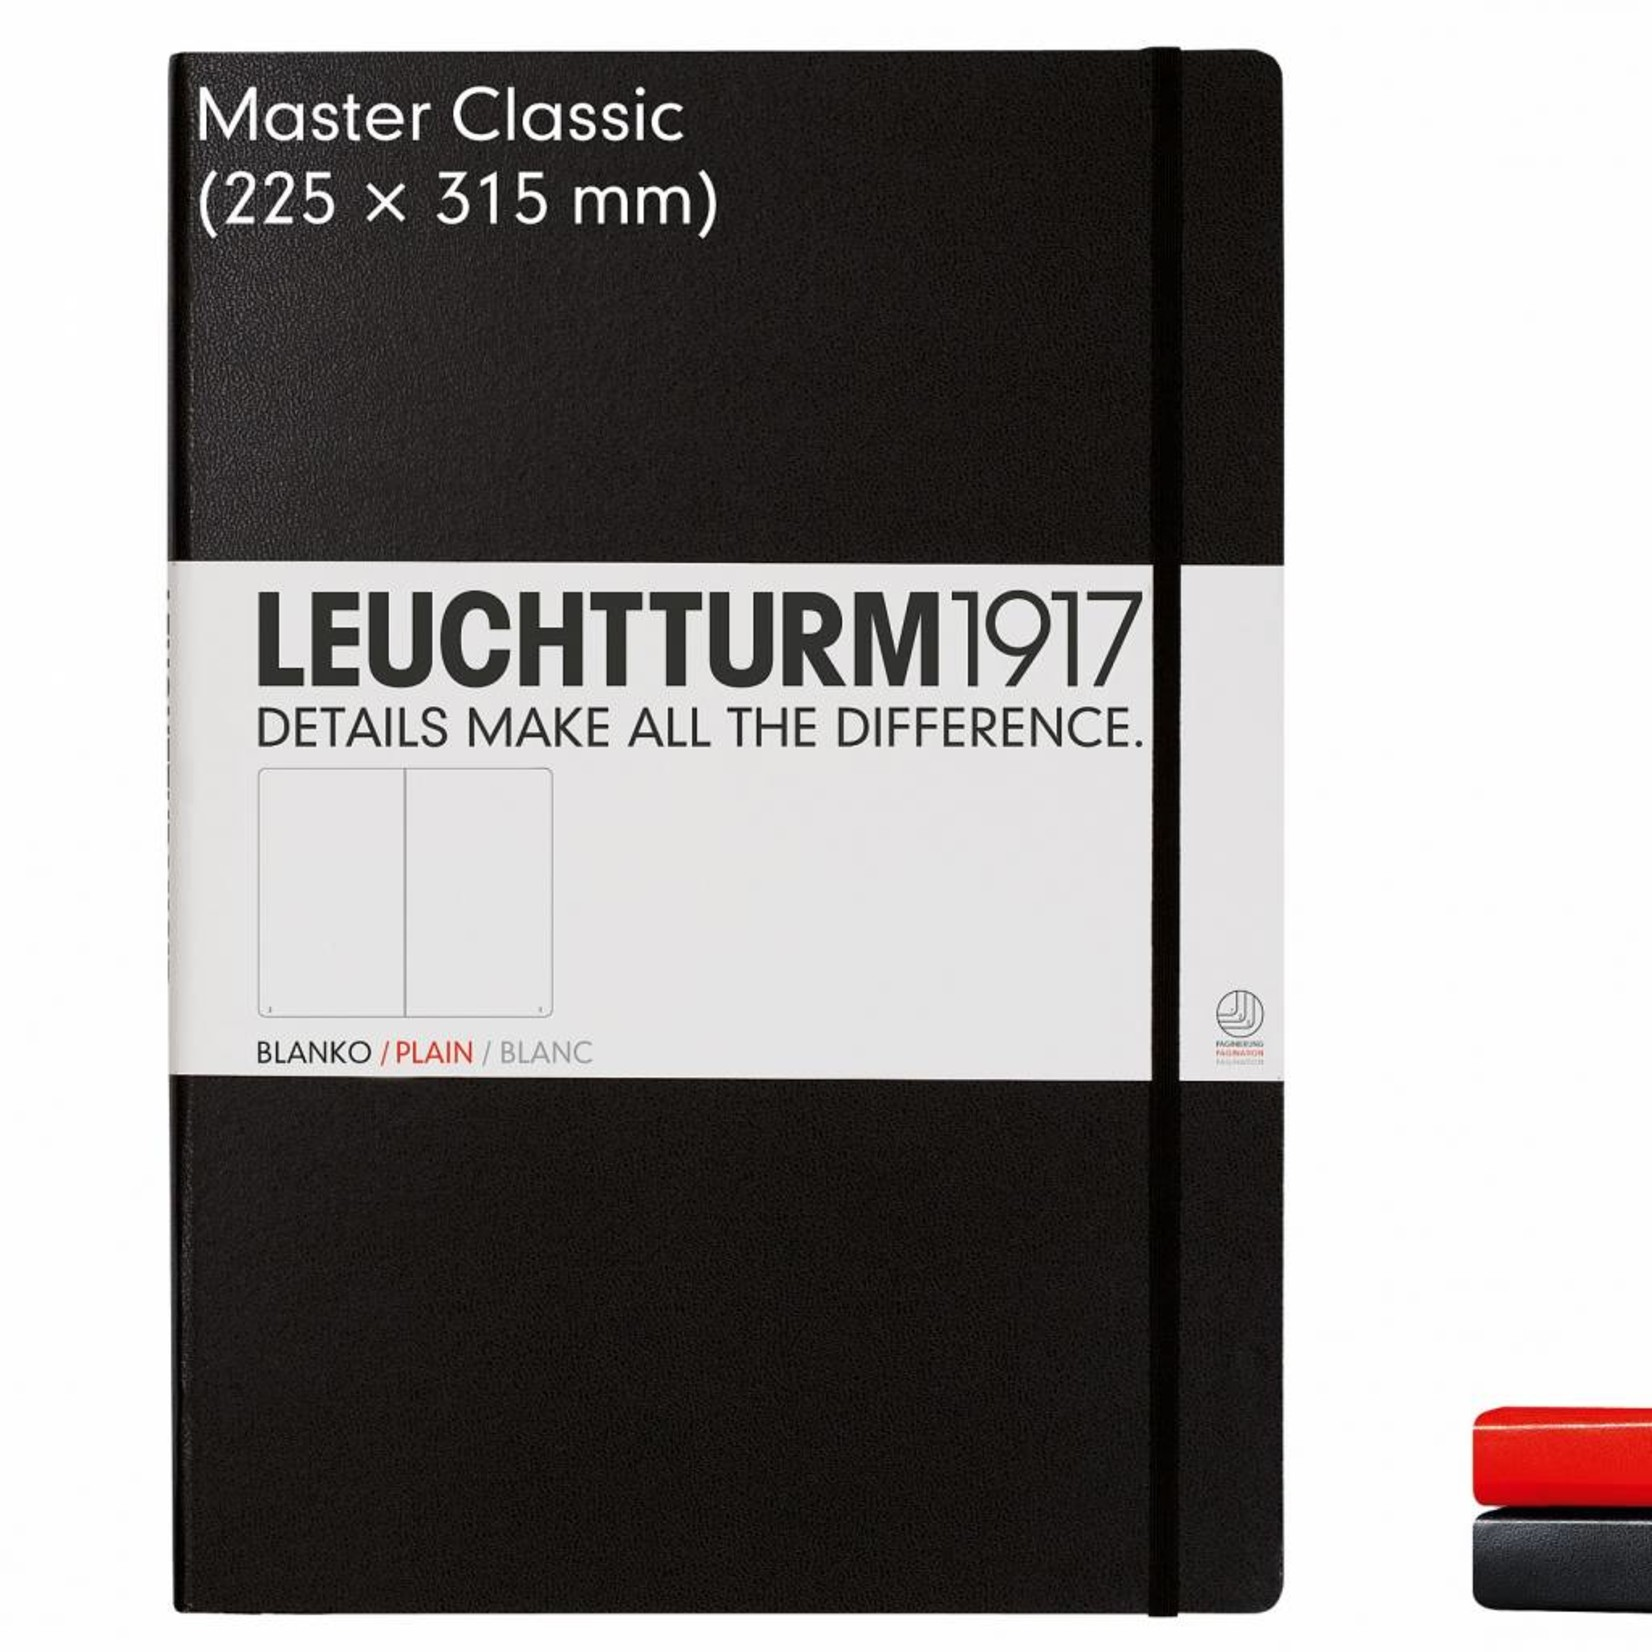 Leuchtturm1917 Leuchtturm1917 Notizbuch, Master Classic, Schwarz, Kariert